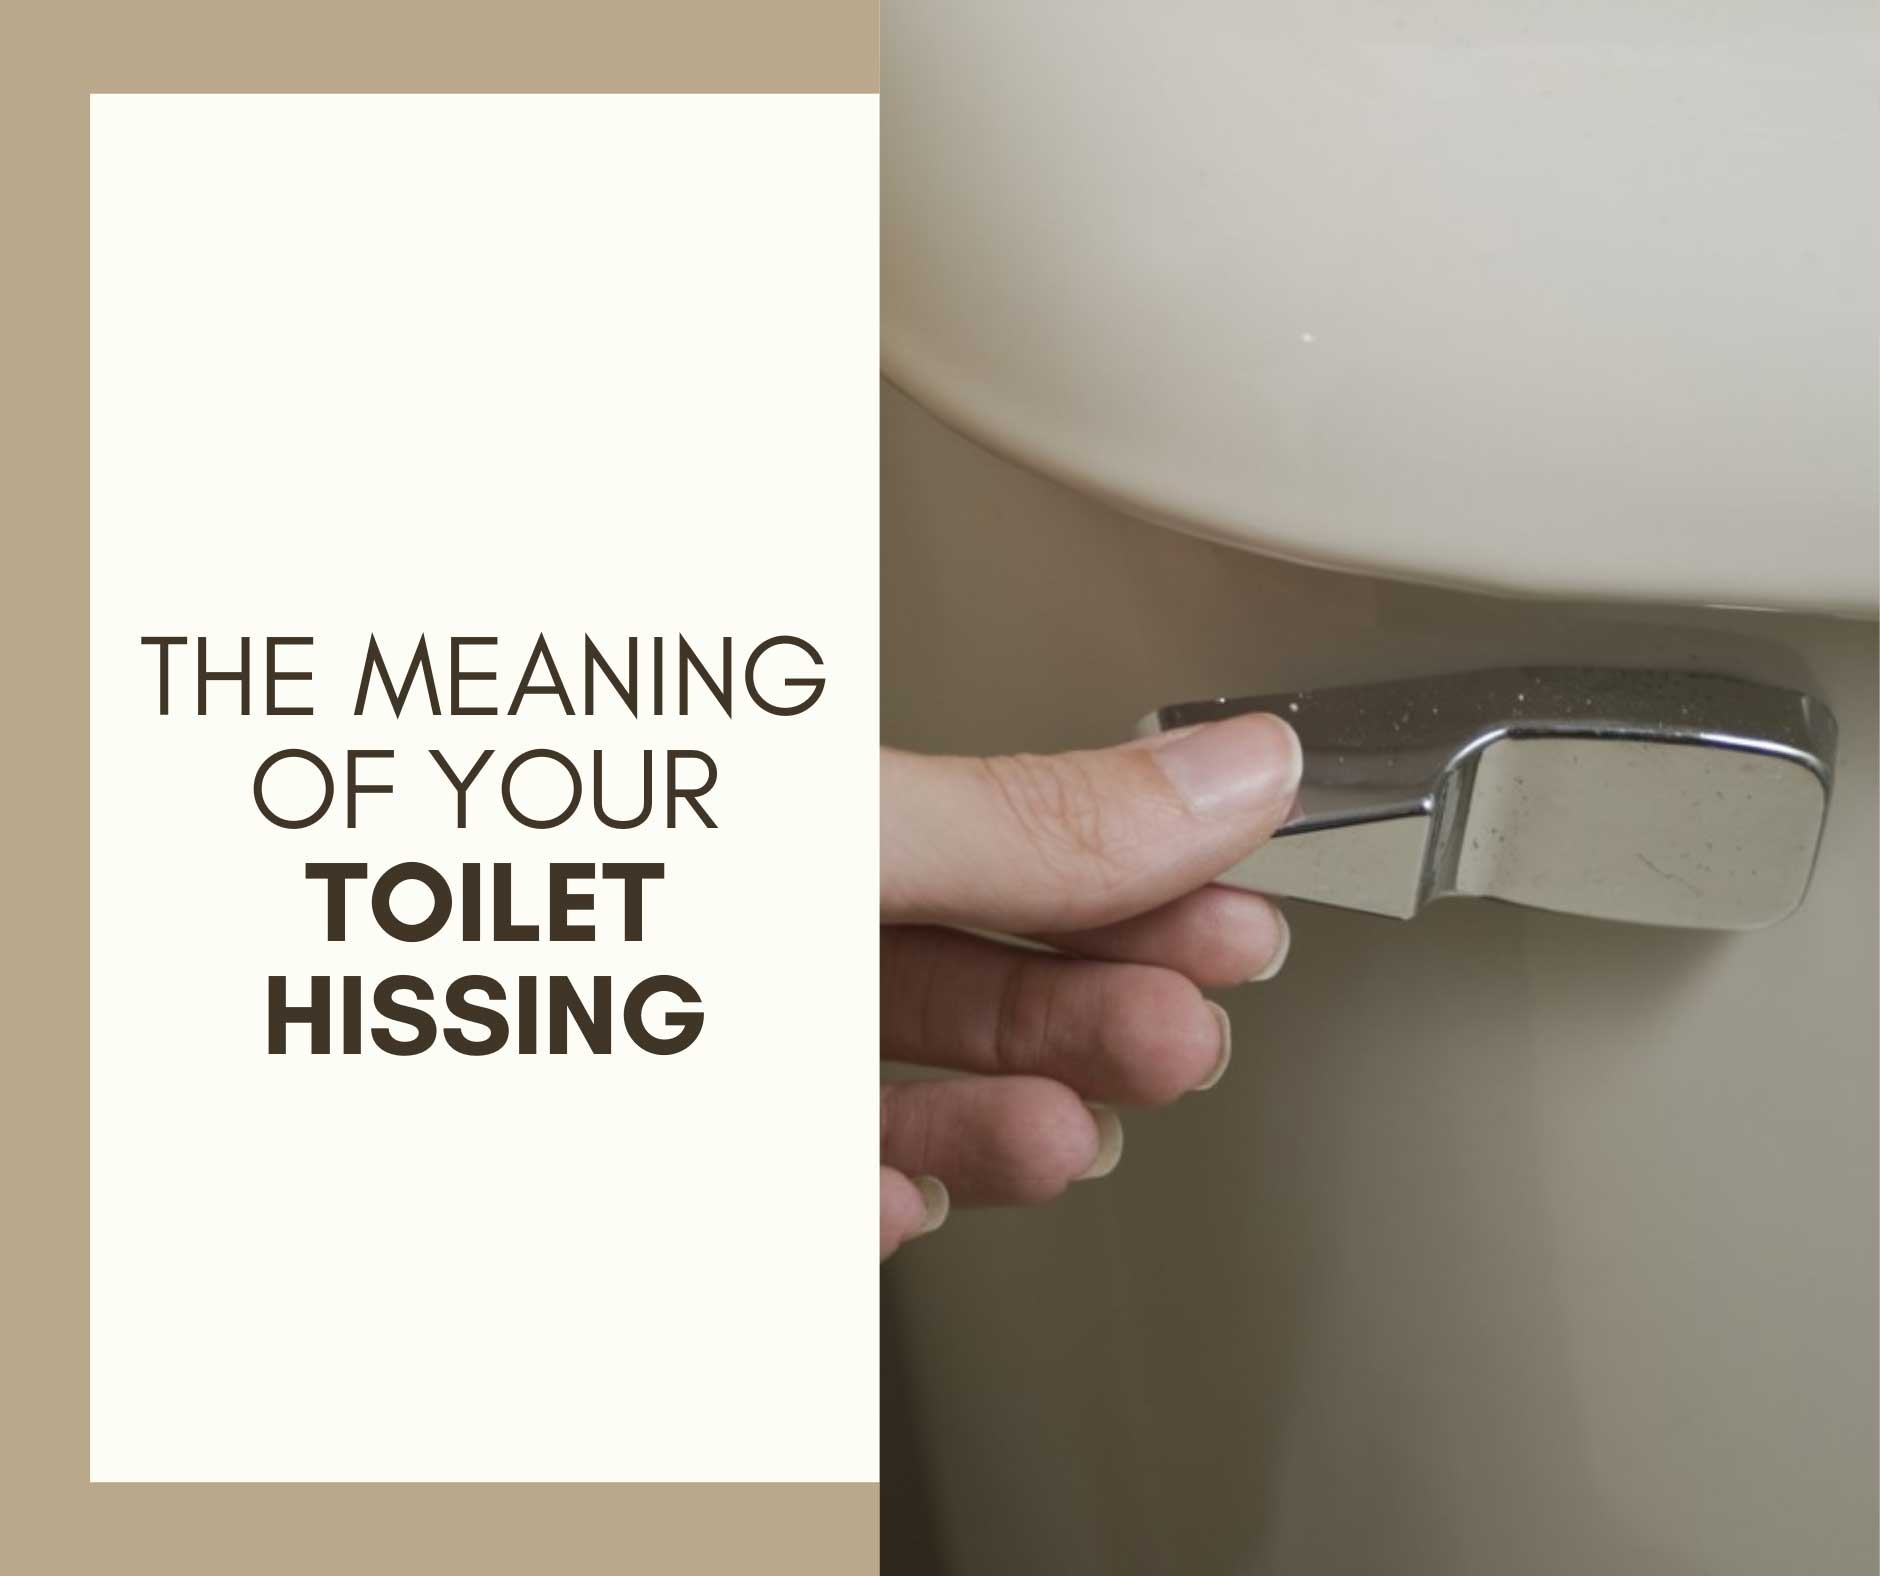 Toilet Hissing